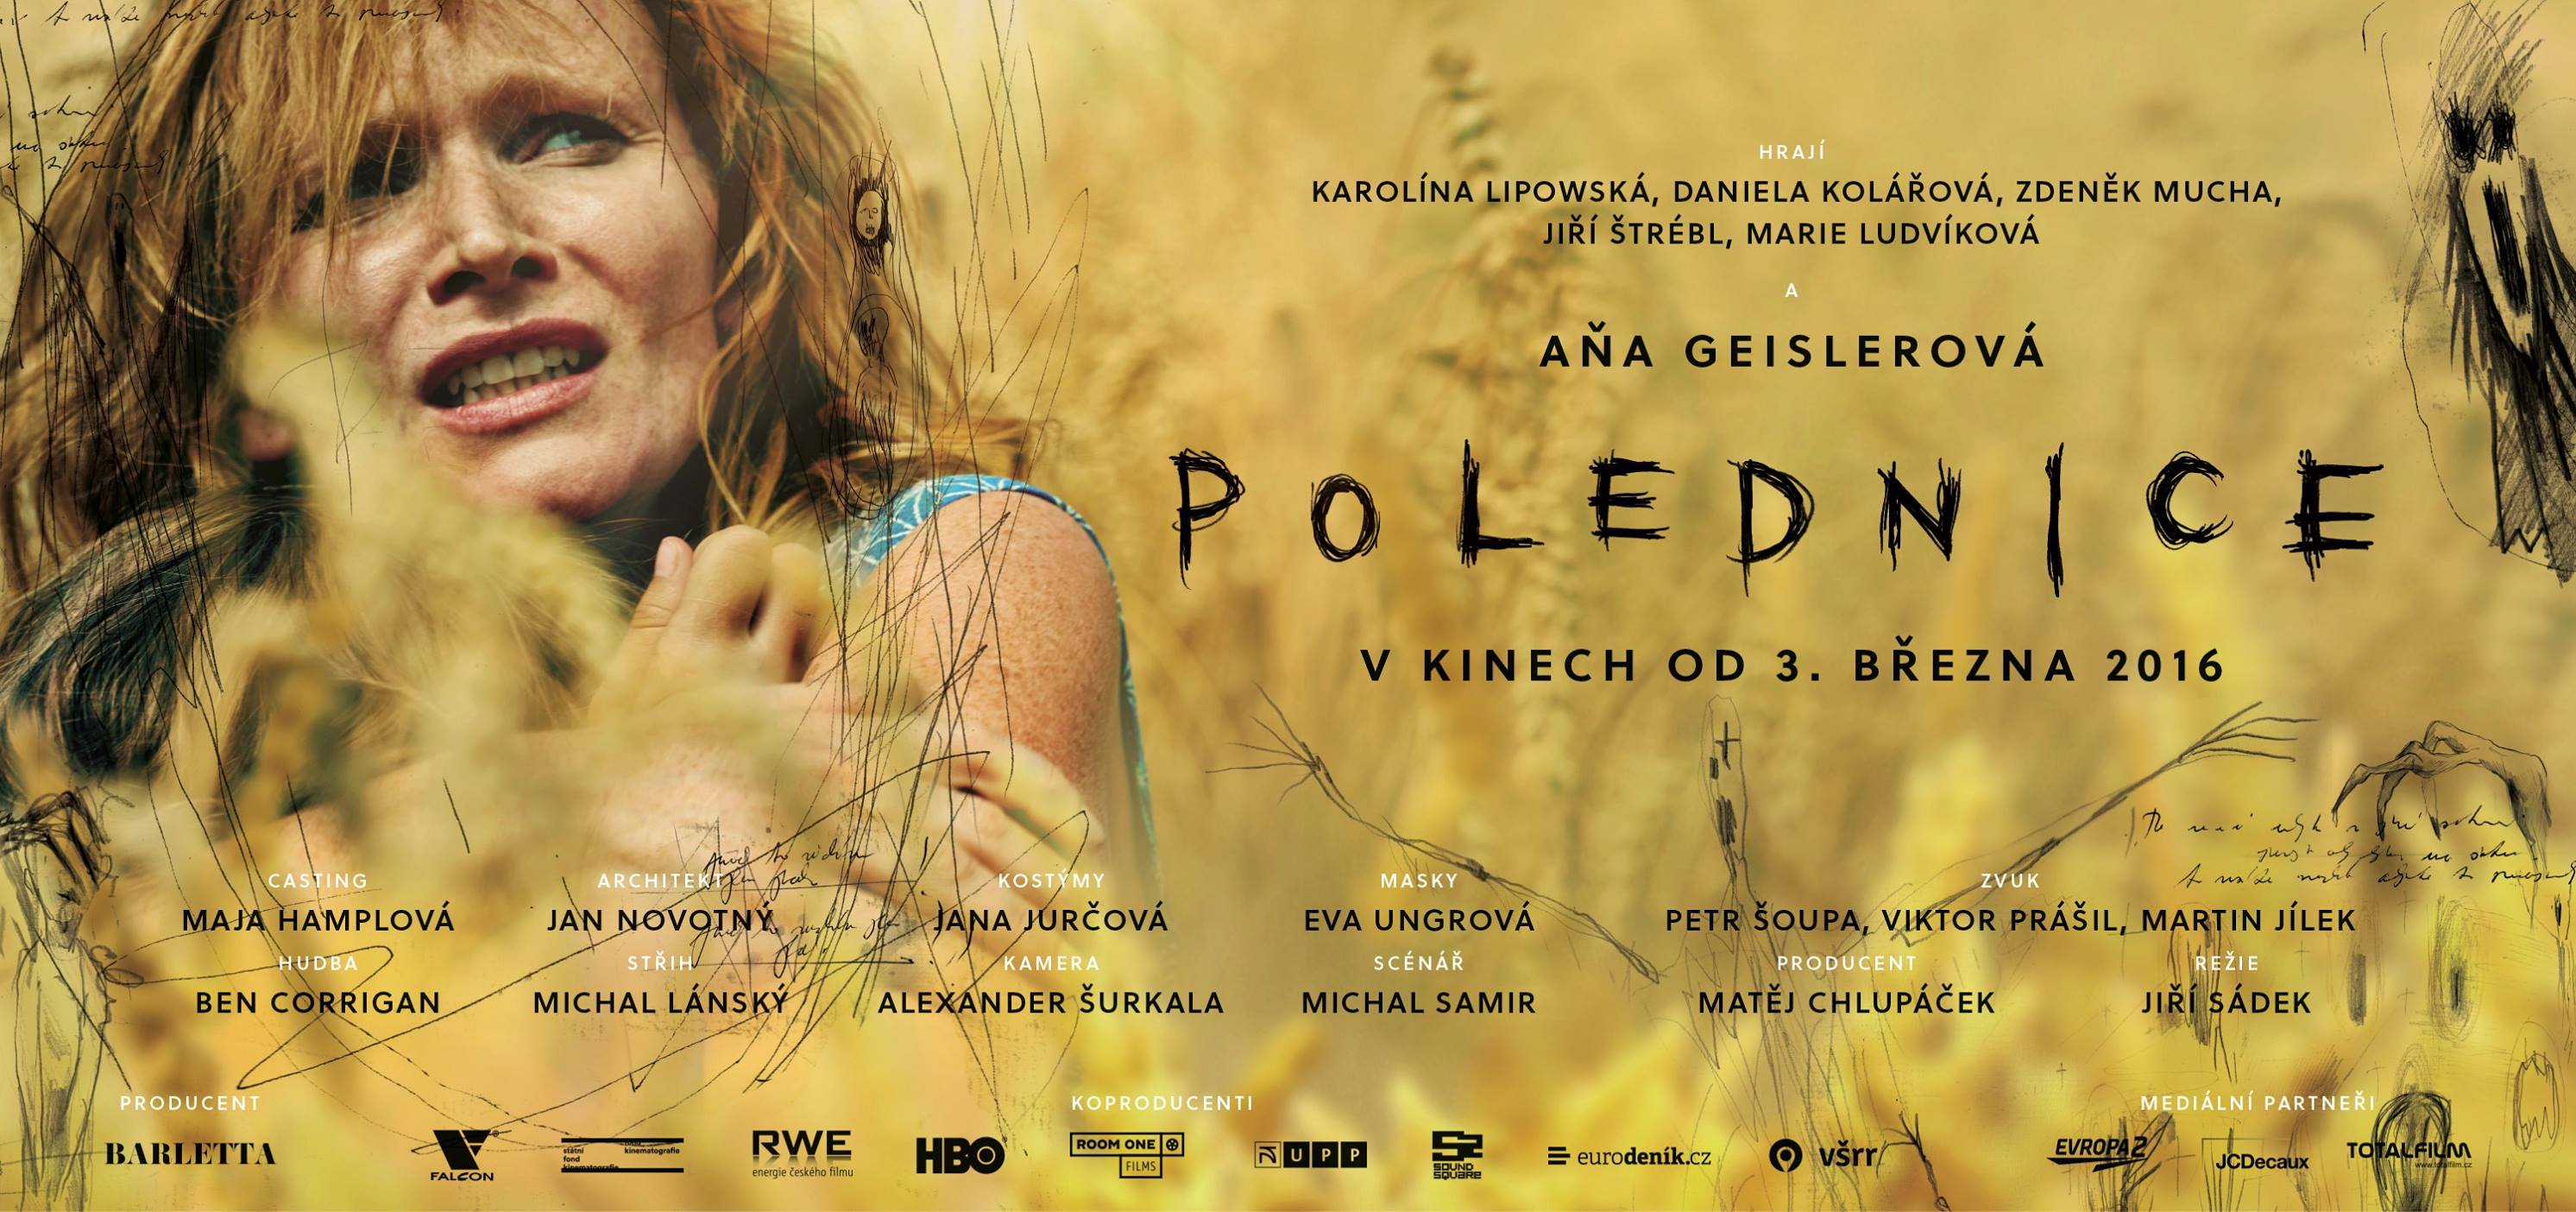 Polednice (2015)